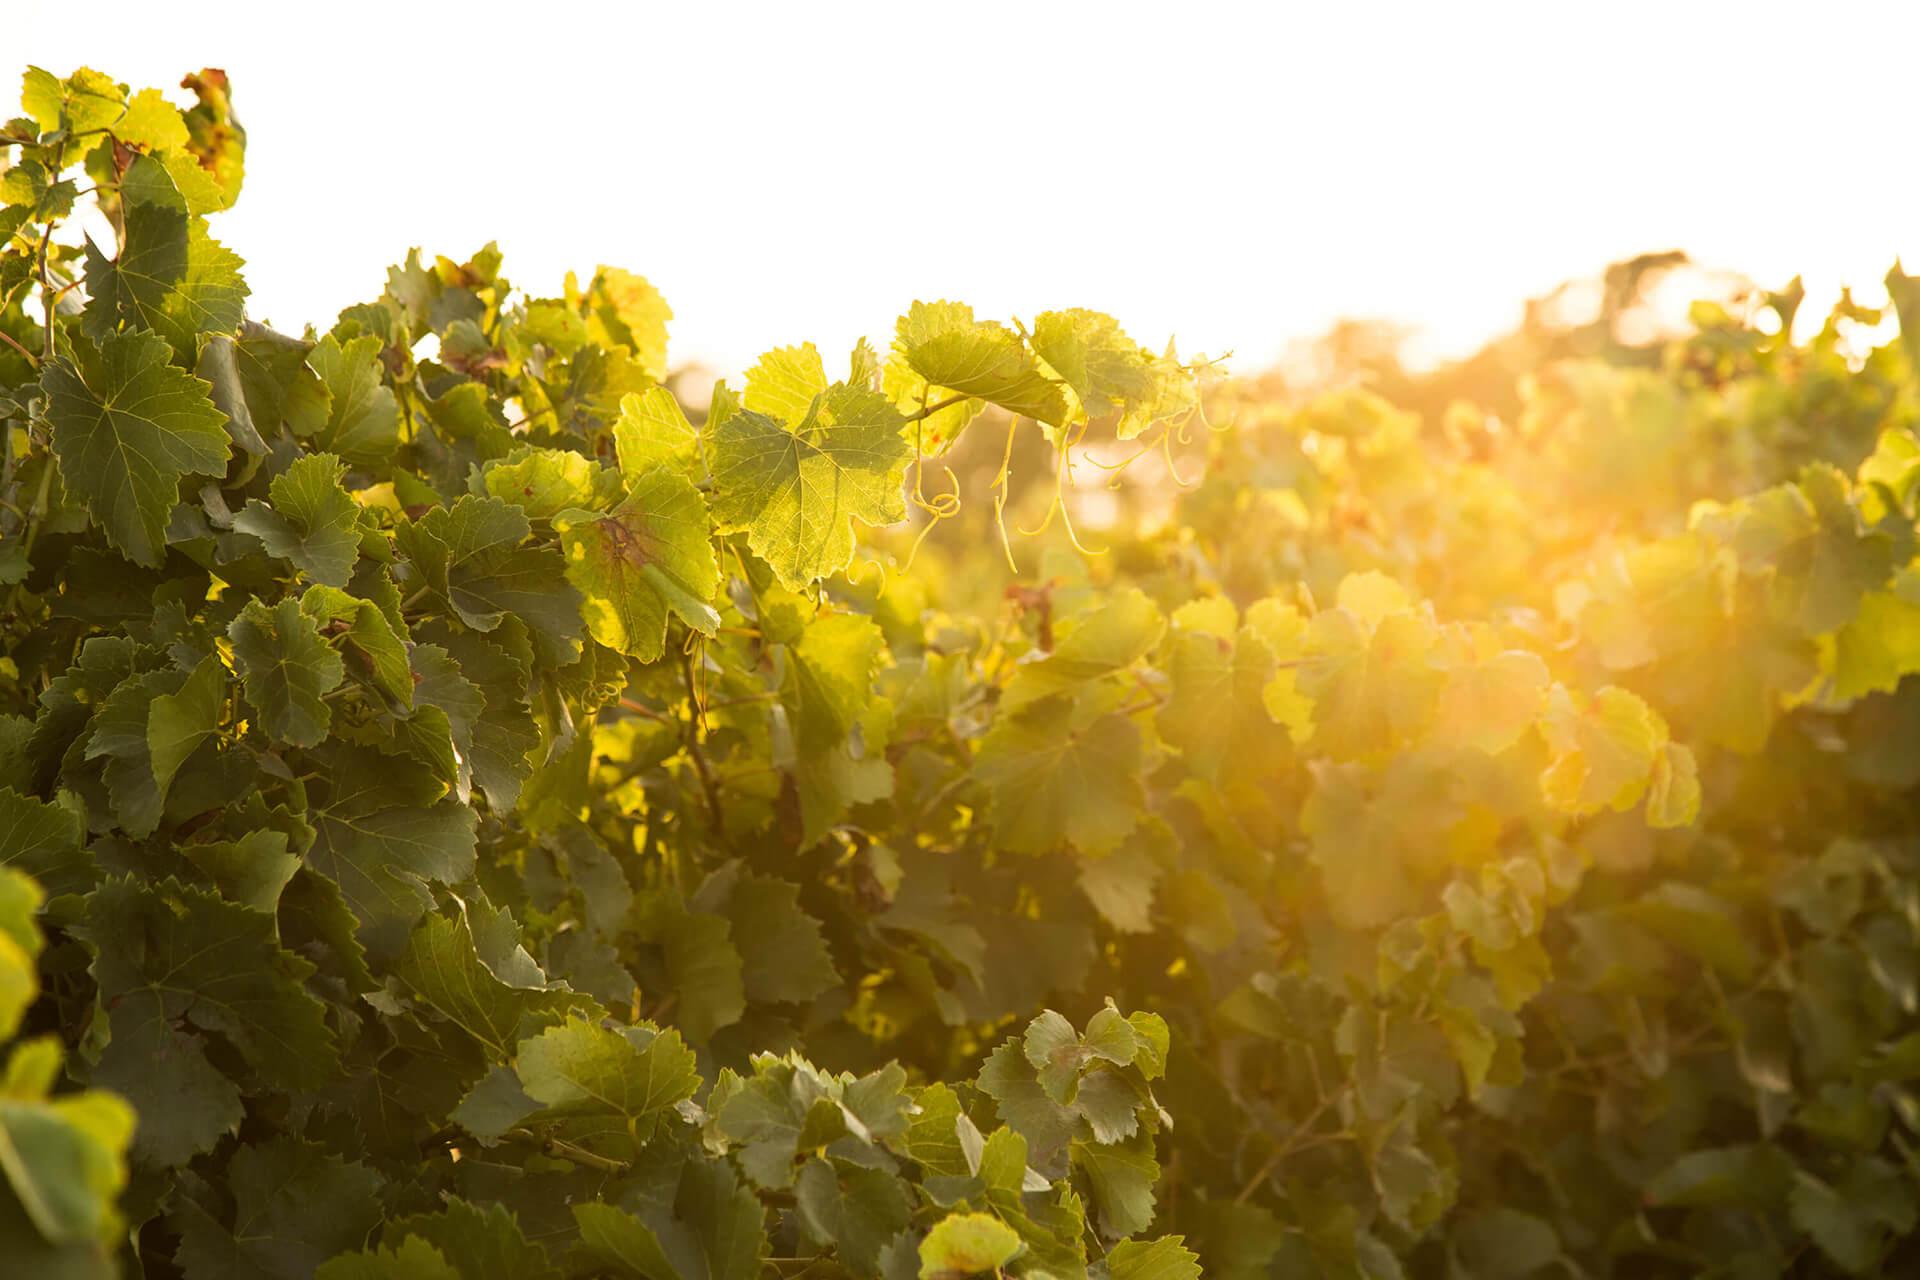 Chateau Leoube, South of France, Bamford, Organic, Greenery, Landscape, Sun Light, Sun Set